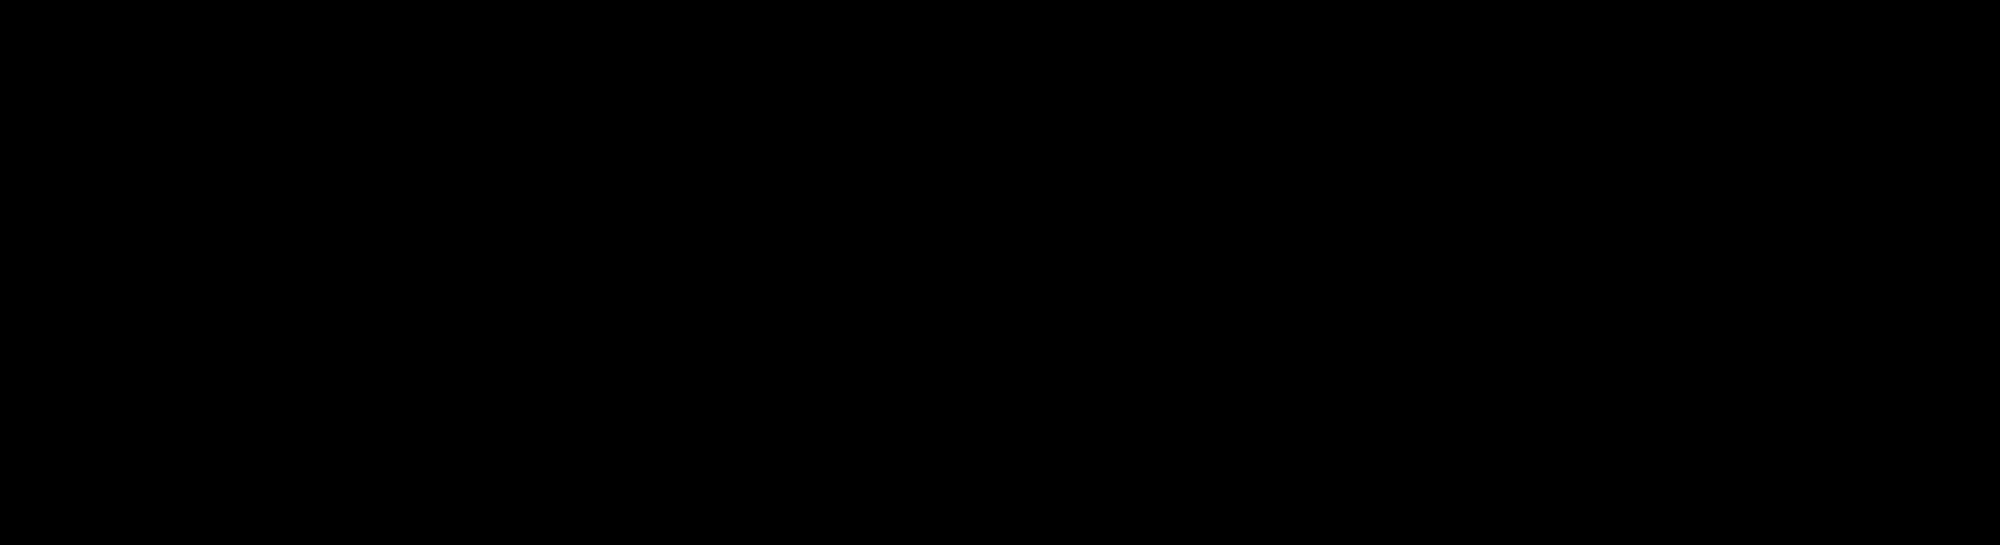 HypnoseKompass